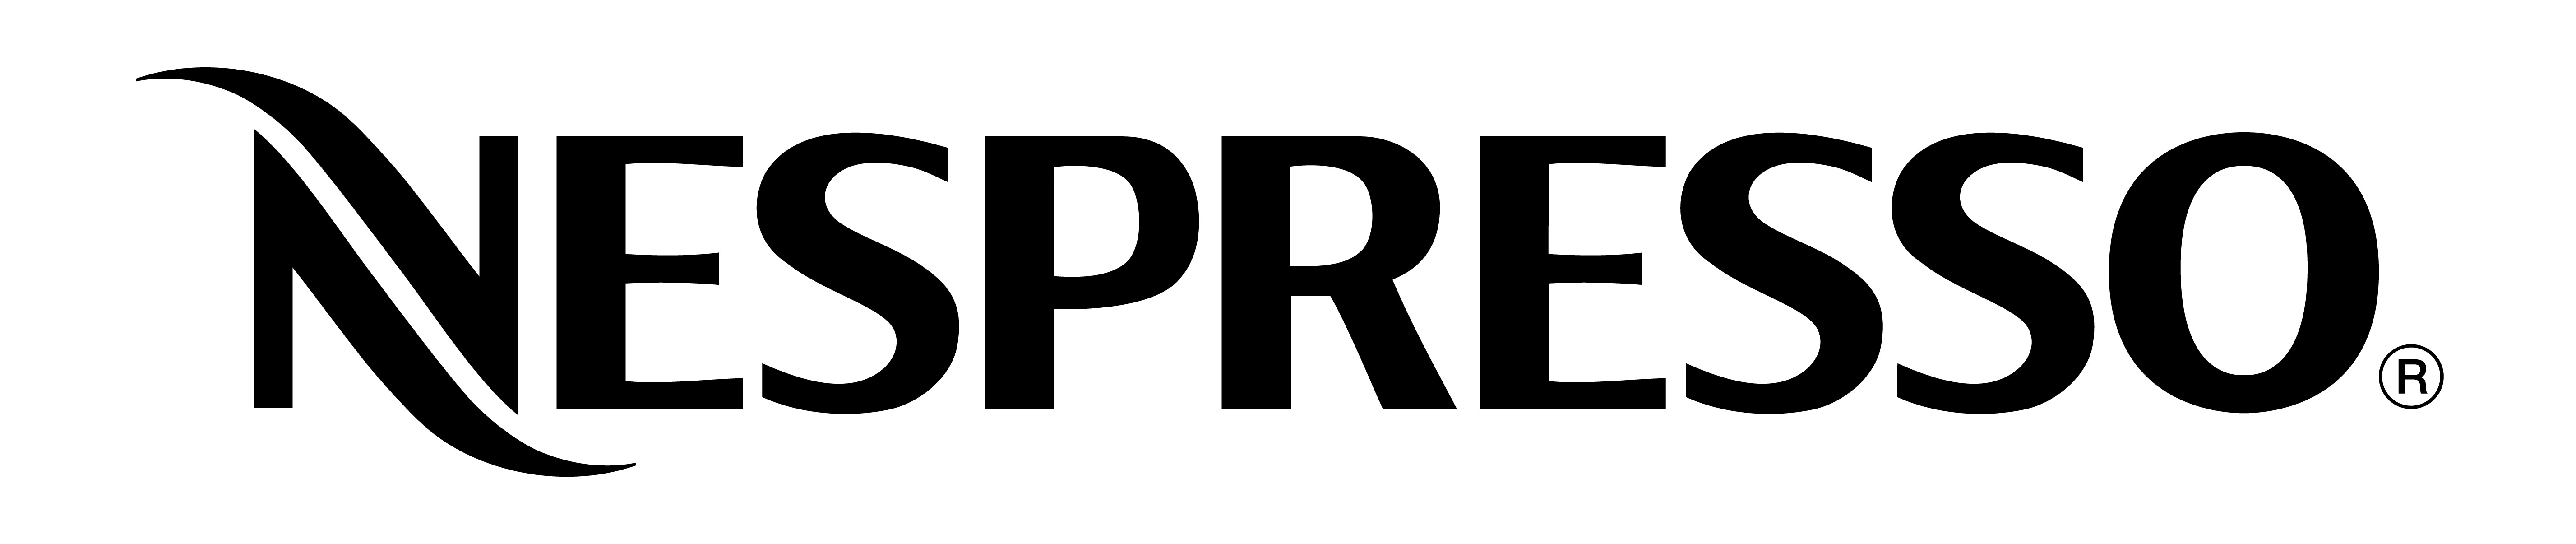 Fichier:Logo Nespresso.png — Wikipédia